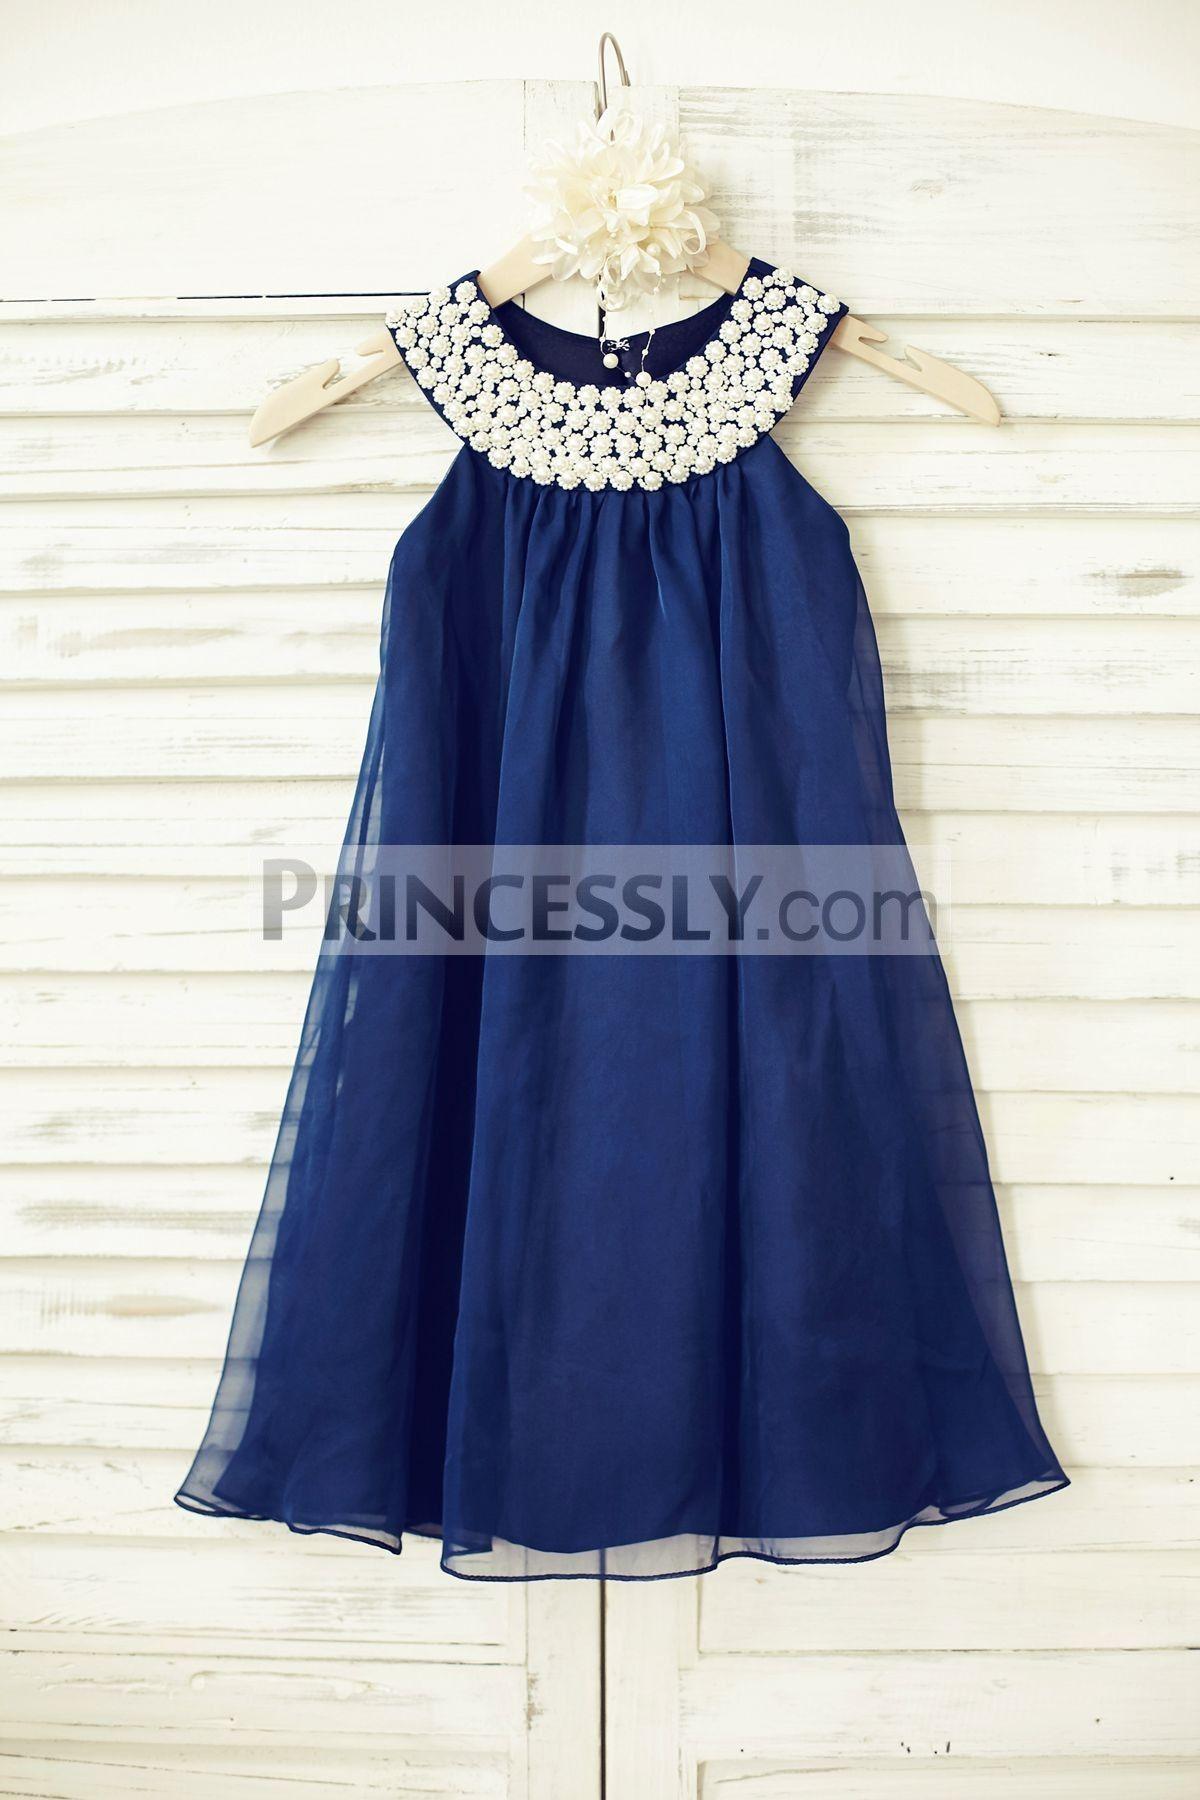 3d4910ae16 Princessly.com-K1000211-Boho Beach Navy Blue Chiffon Flower Girl Dress with  pearl beaded neck-31